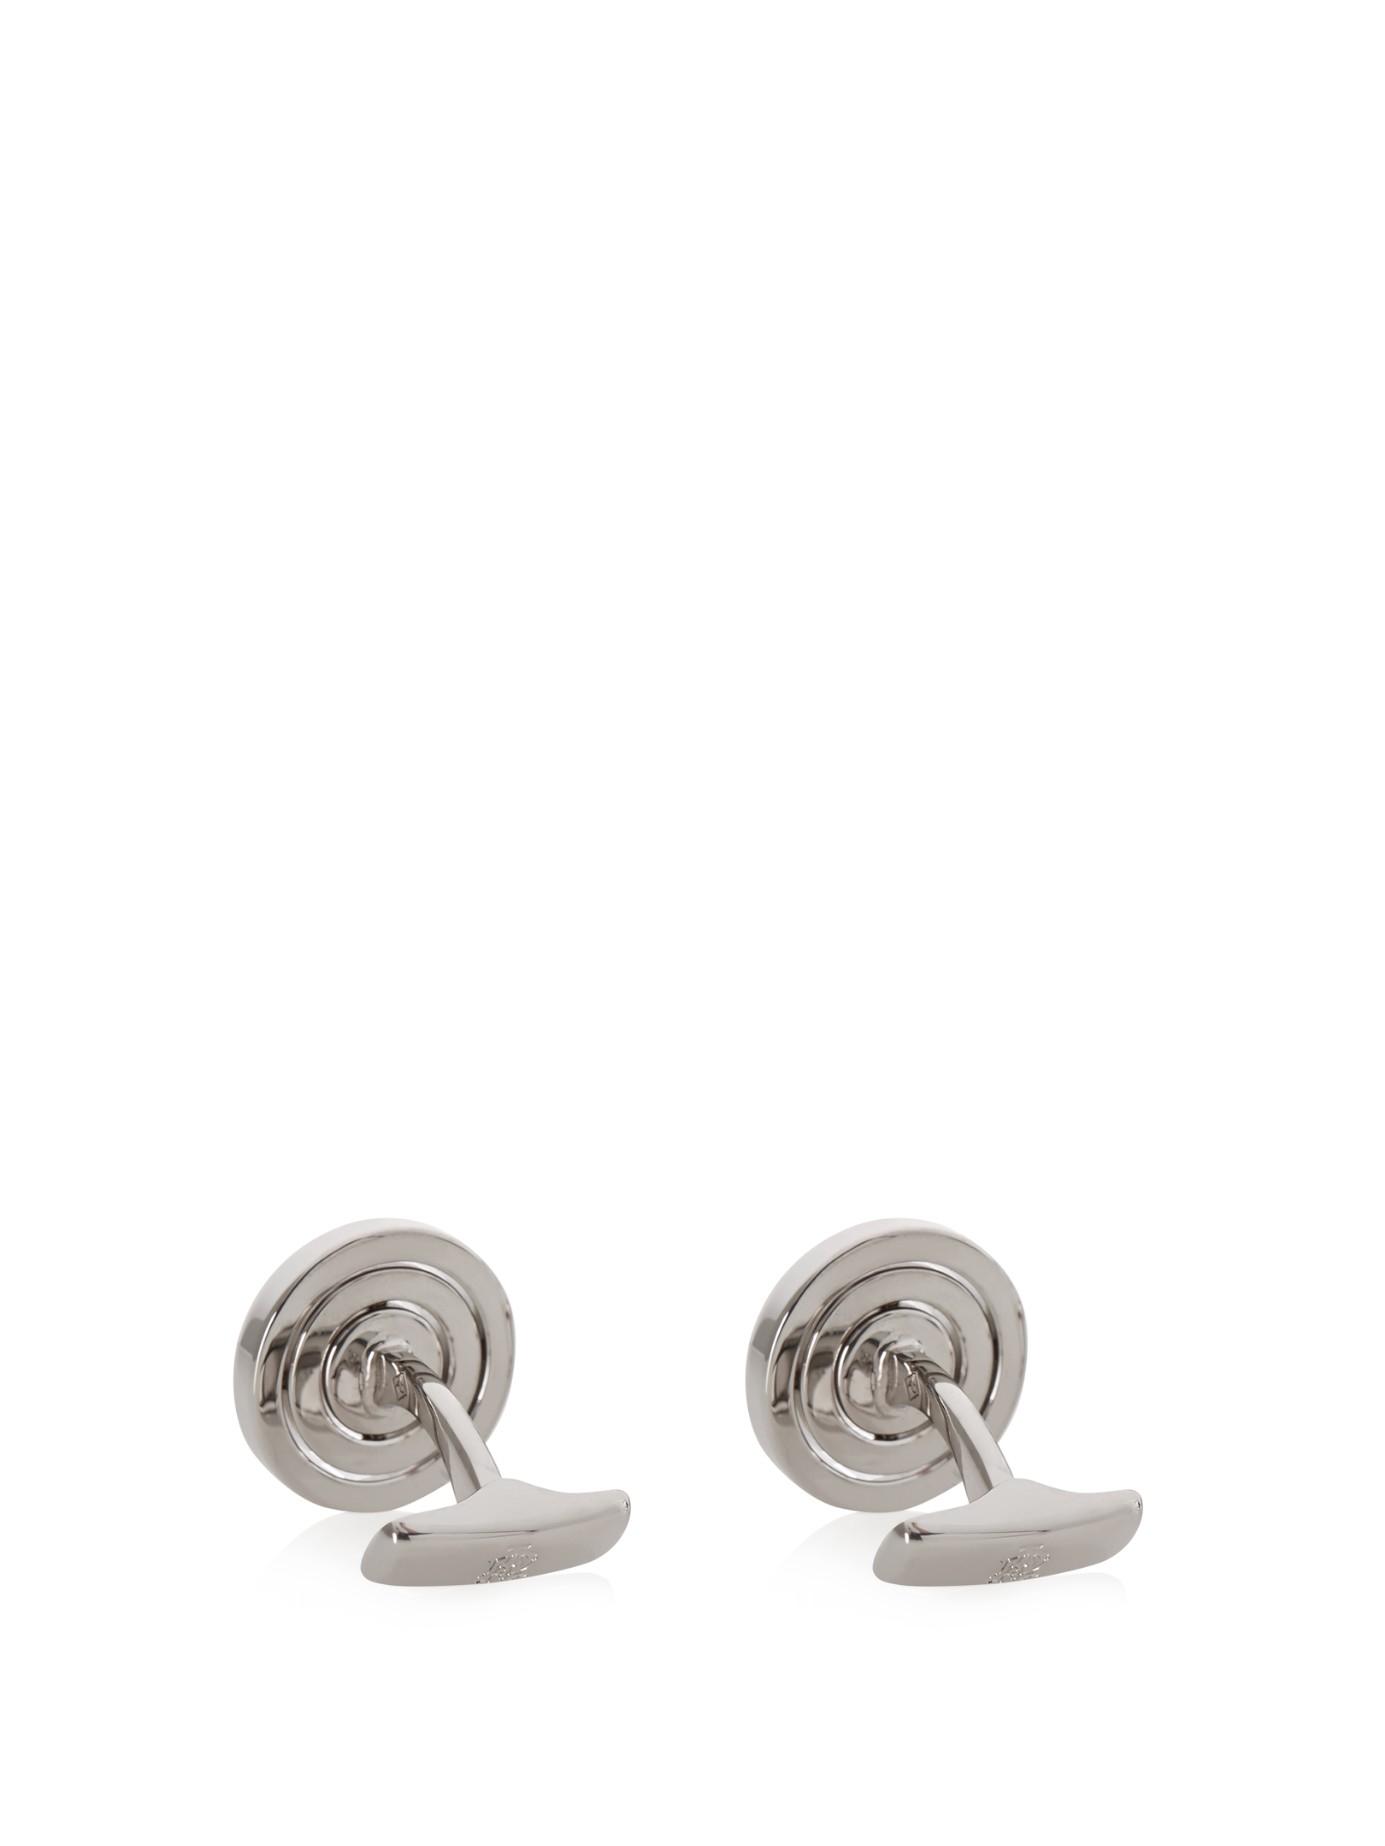 Dunhill Palladium-plated Carbon Fibre Cufflinks - Silver r1lFj